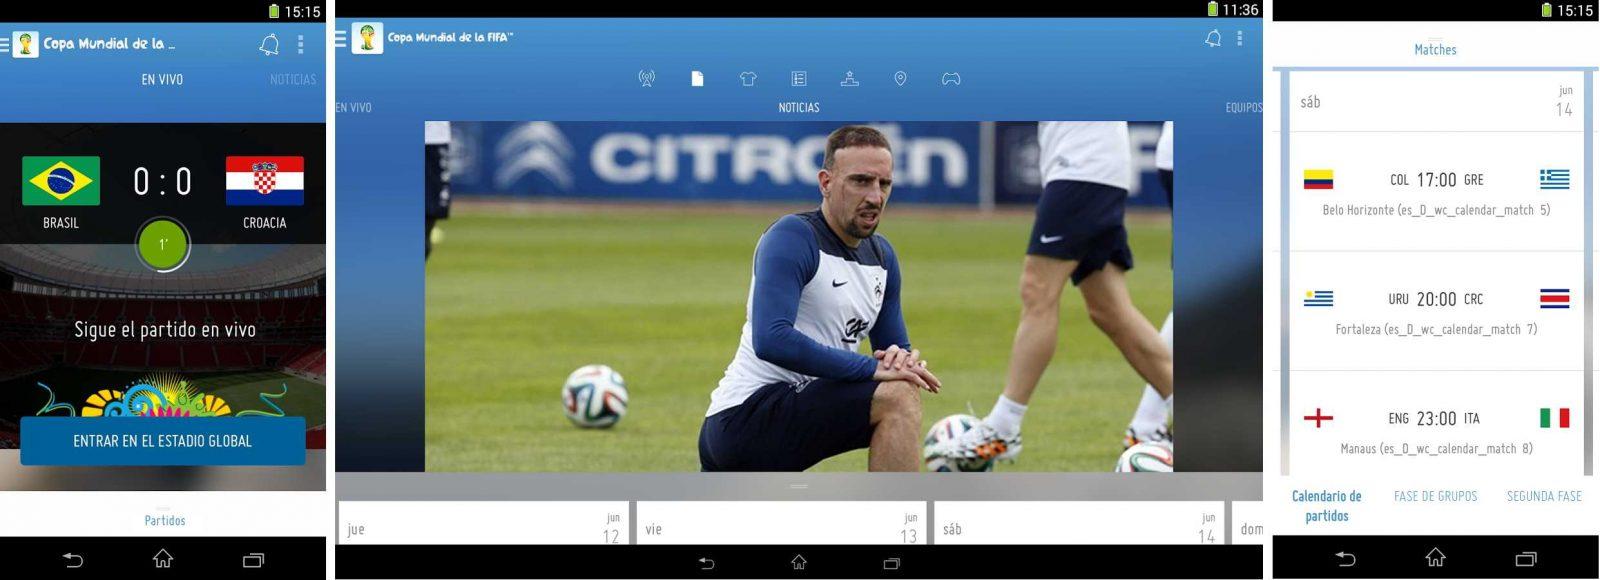 App de fútbol Android FIFA Official